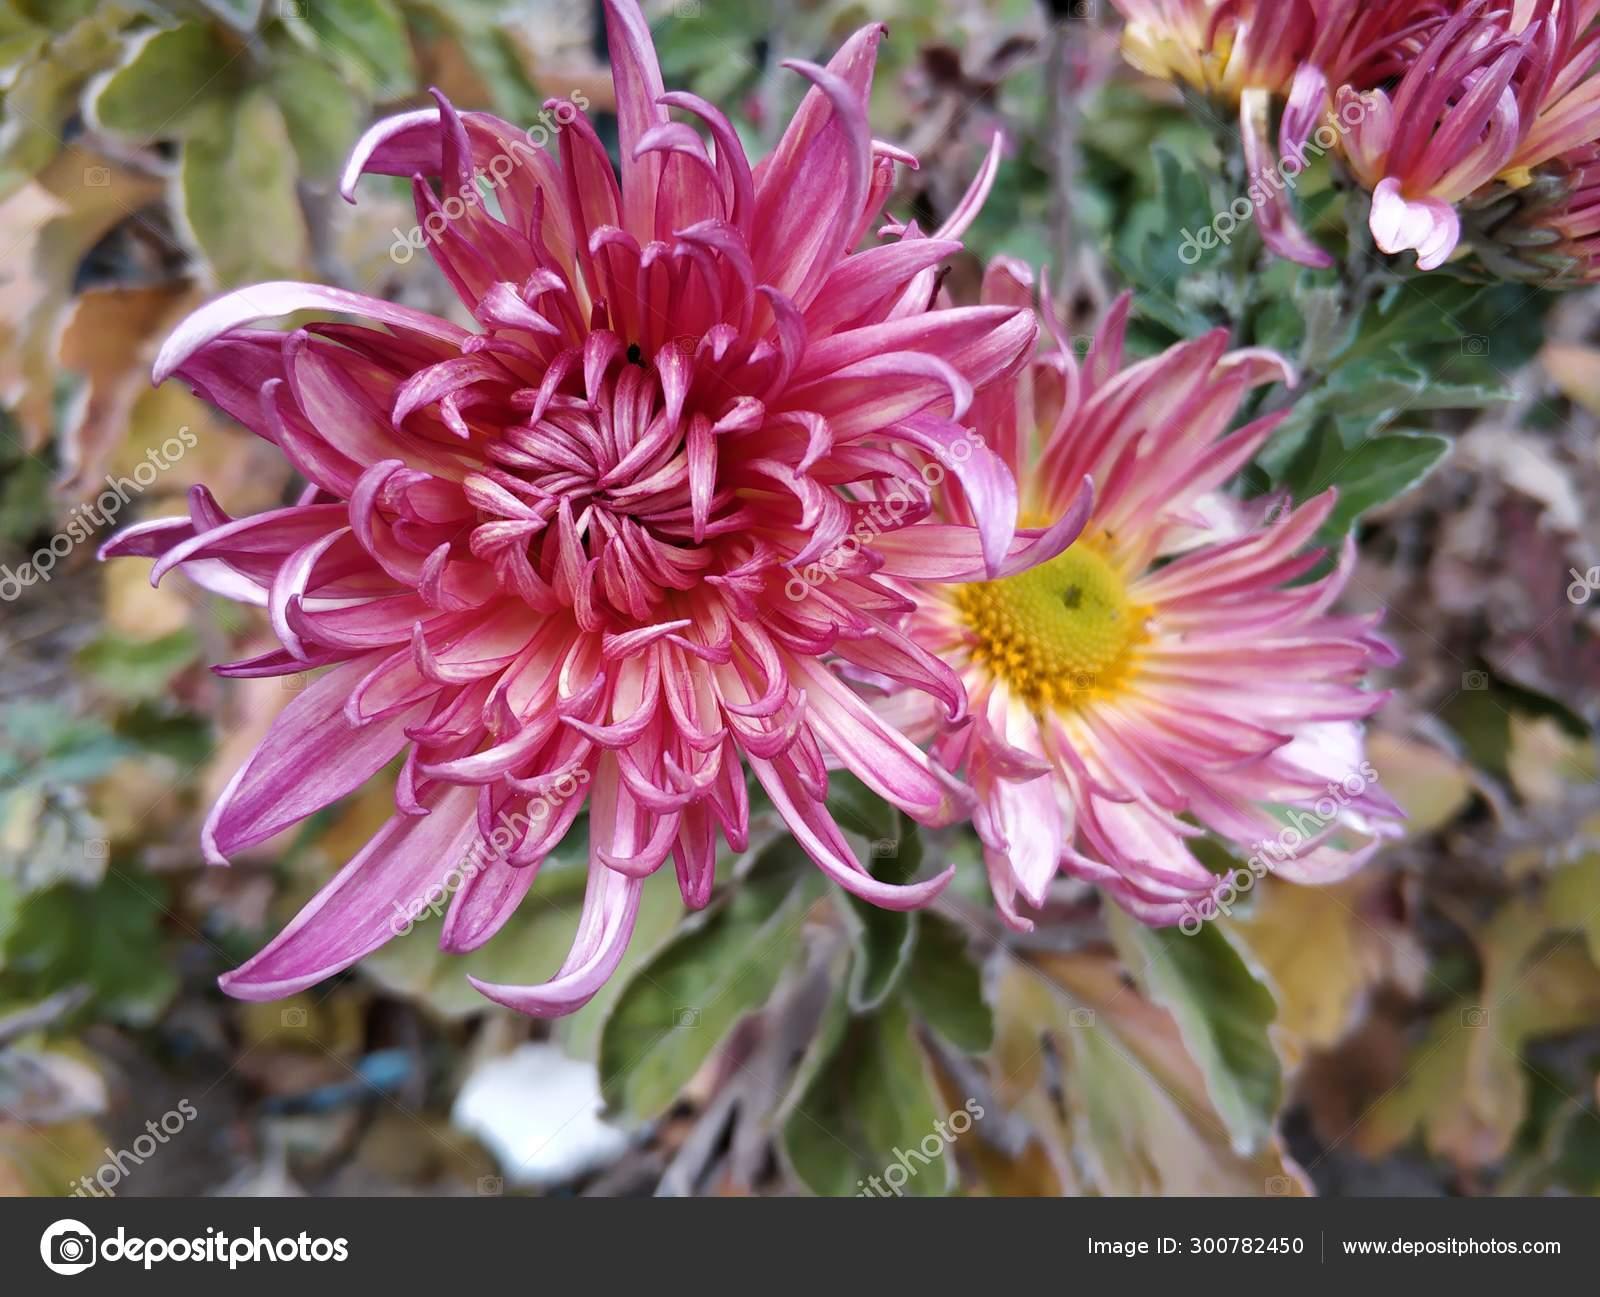 Flor Dahlia Rosa Jardim Stock Photo C Imaginechina Tuchong 300782450